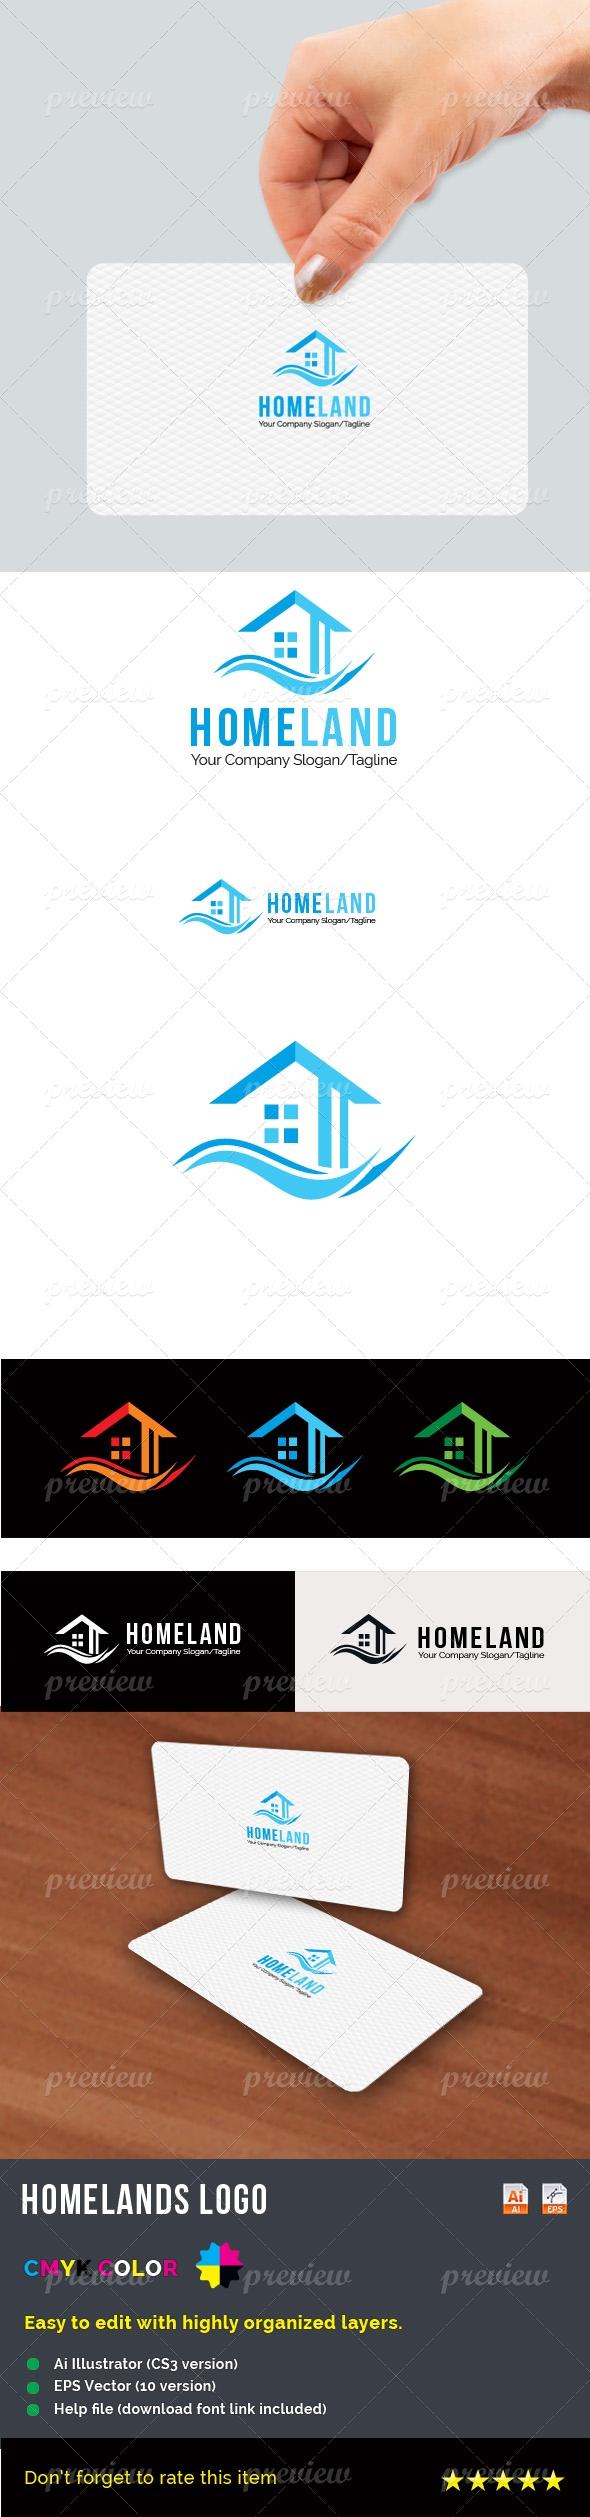 HomeLand Logo Print templates, Logos, Logo color